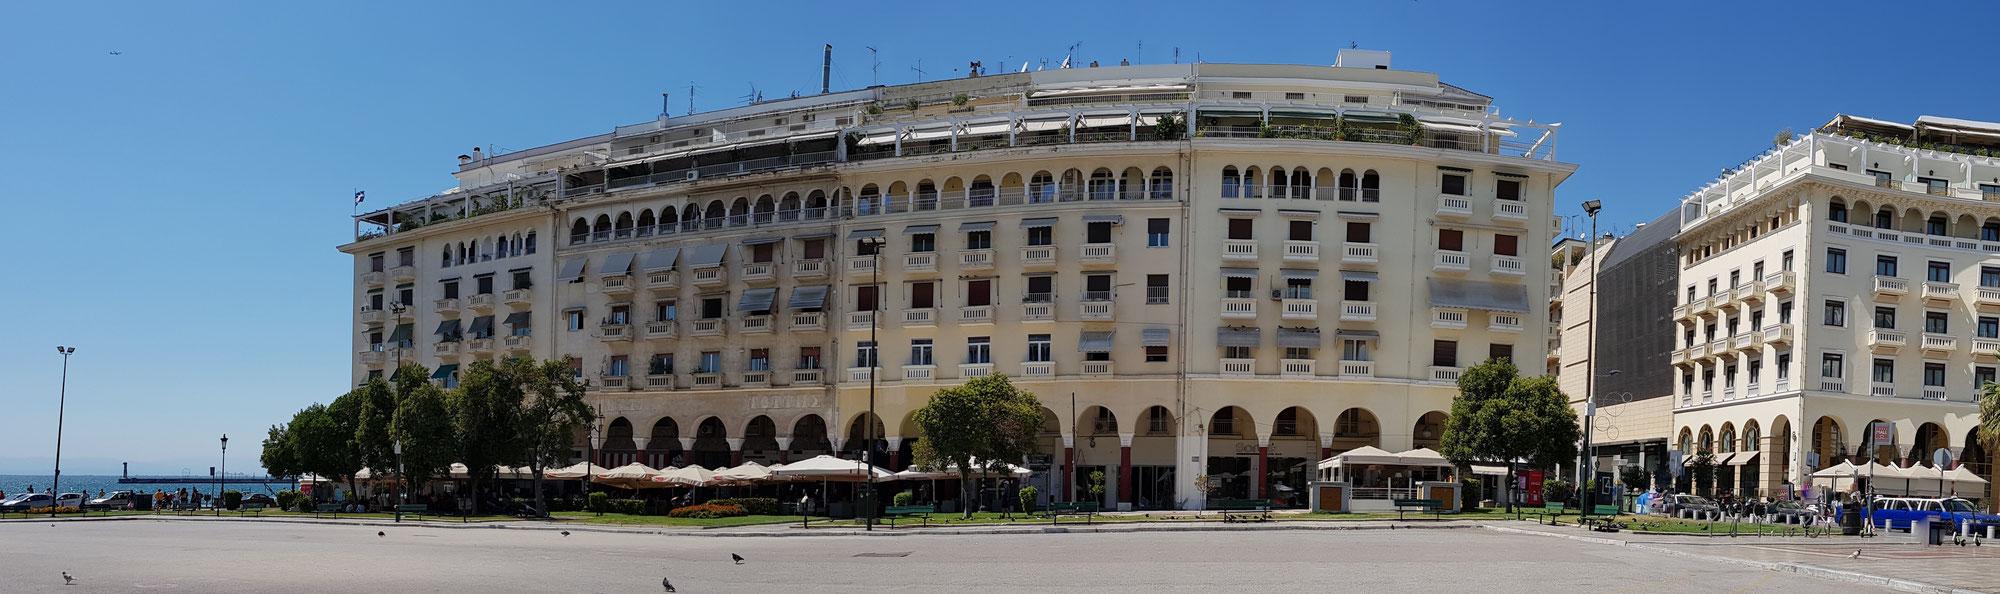 April in Thessaloniki - Leben mit dem Corona-Lockdown